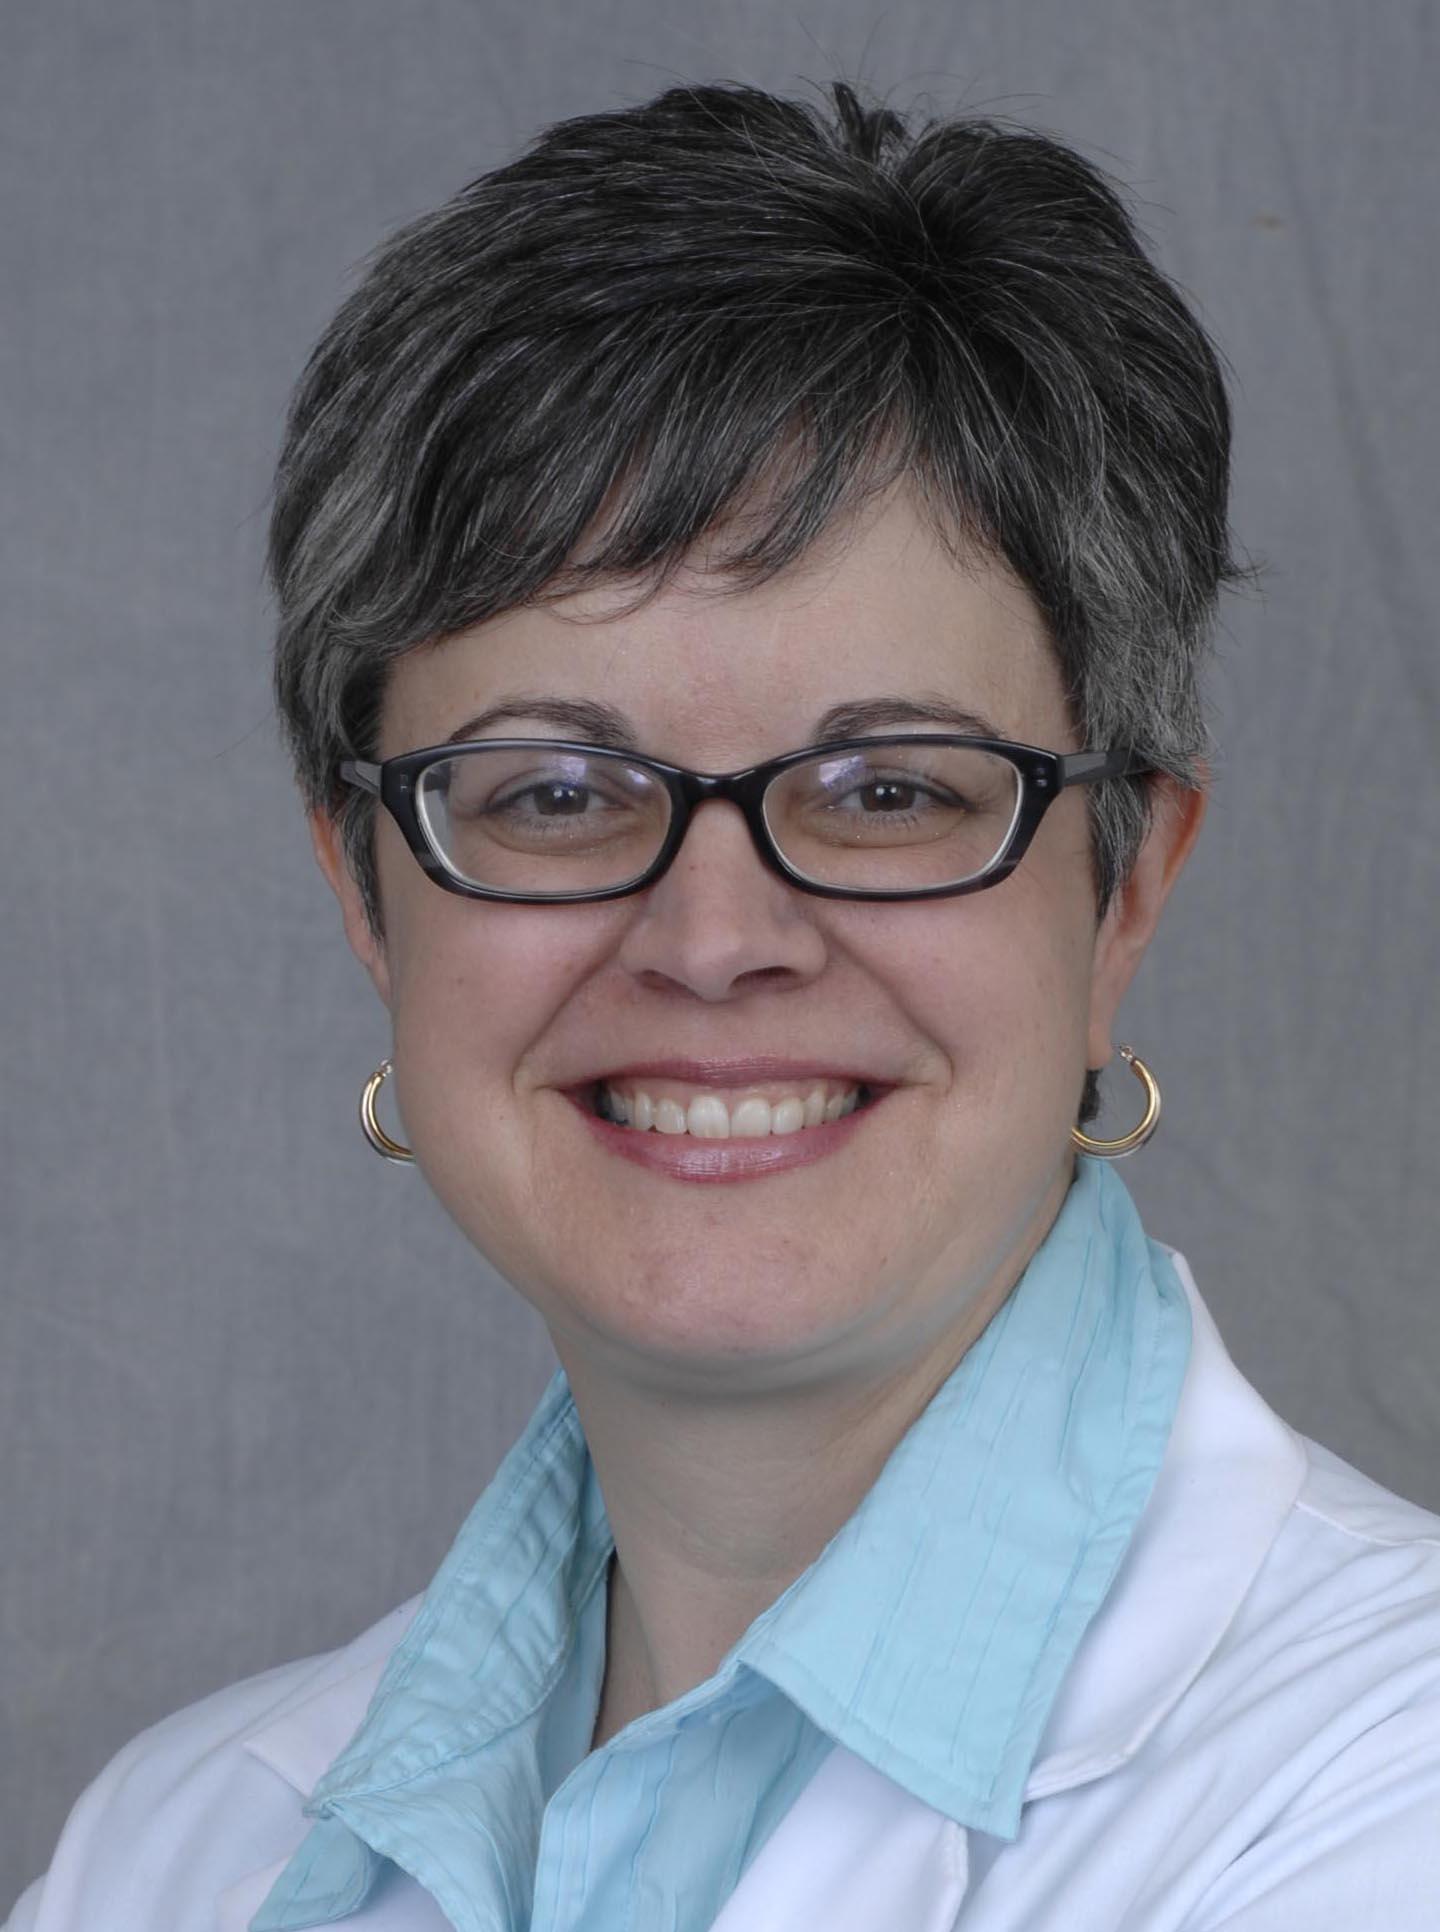 Children's Hospital at Erlanger joins national effort to reverse the obesity epidemic